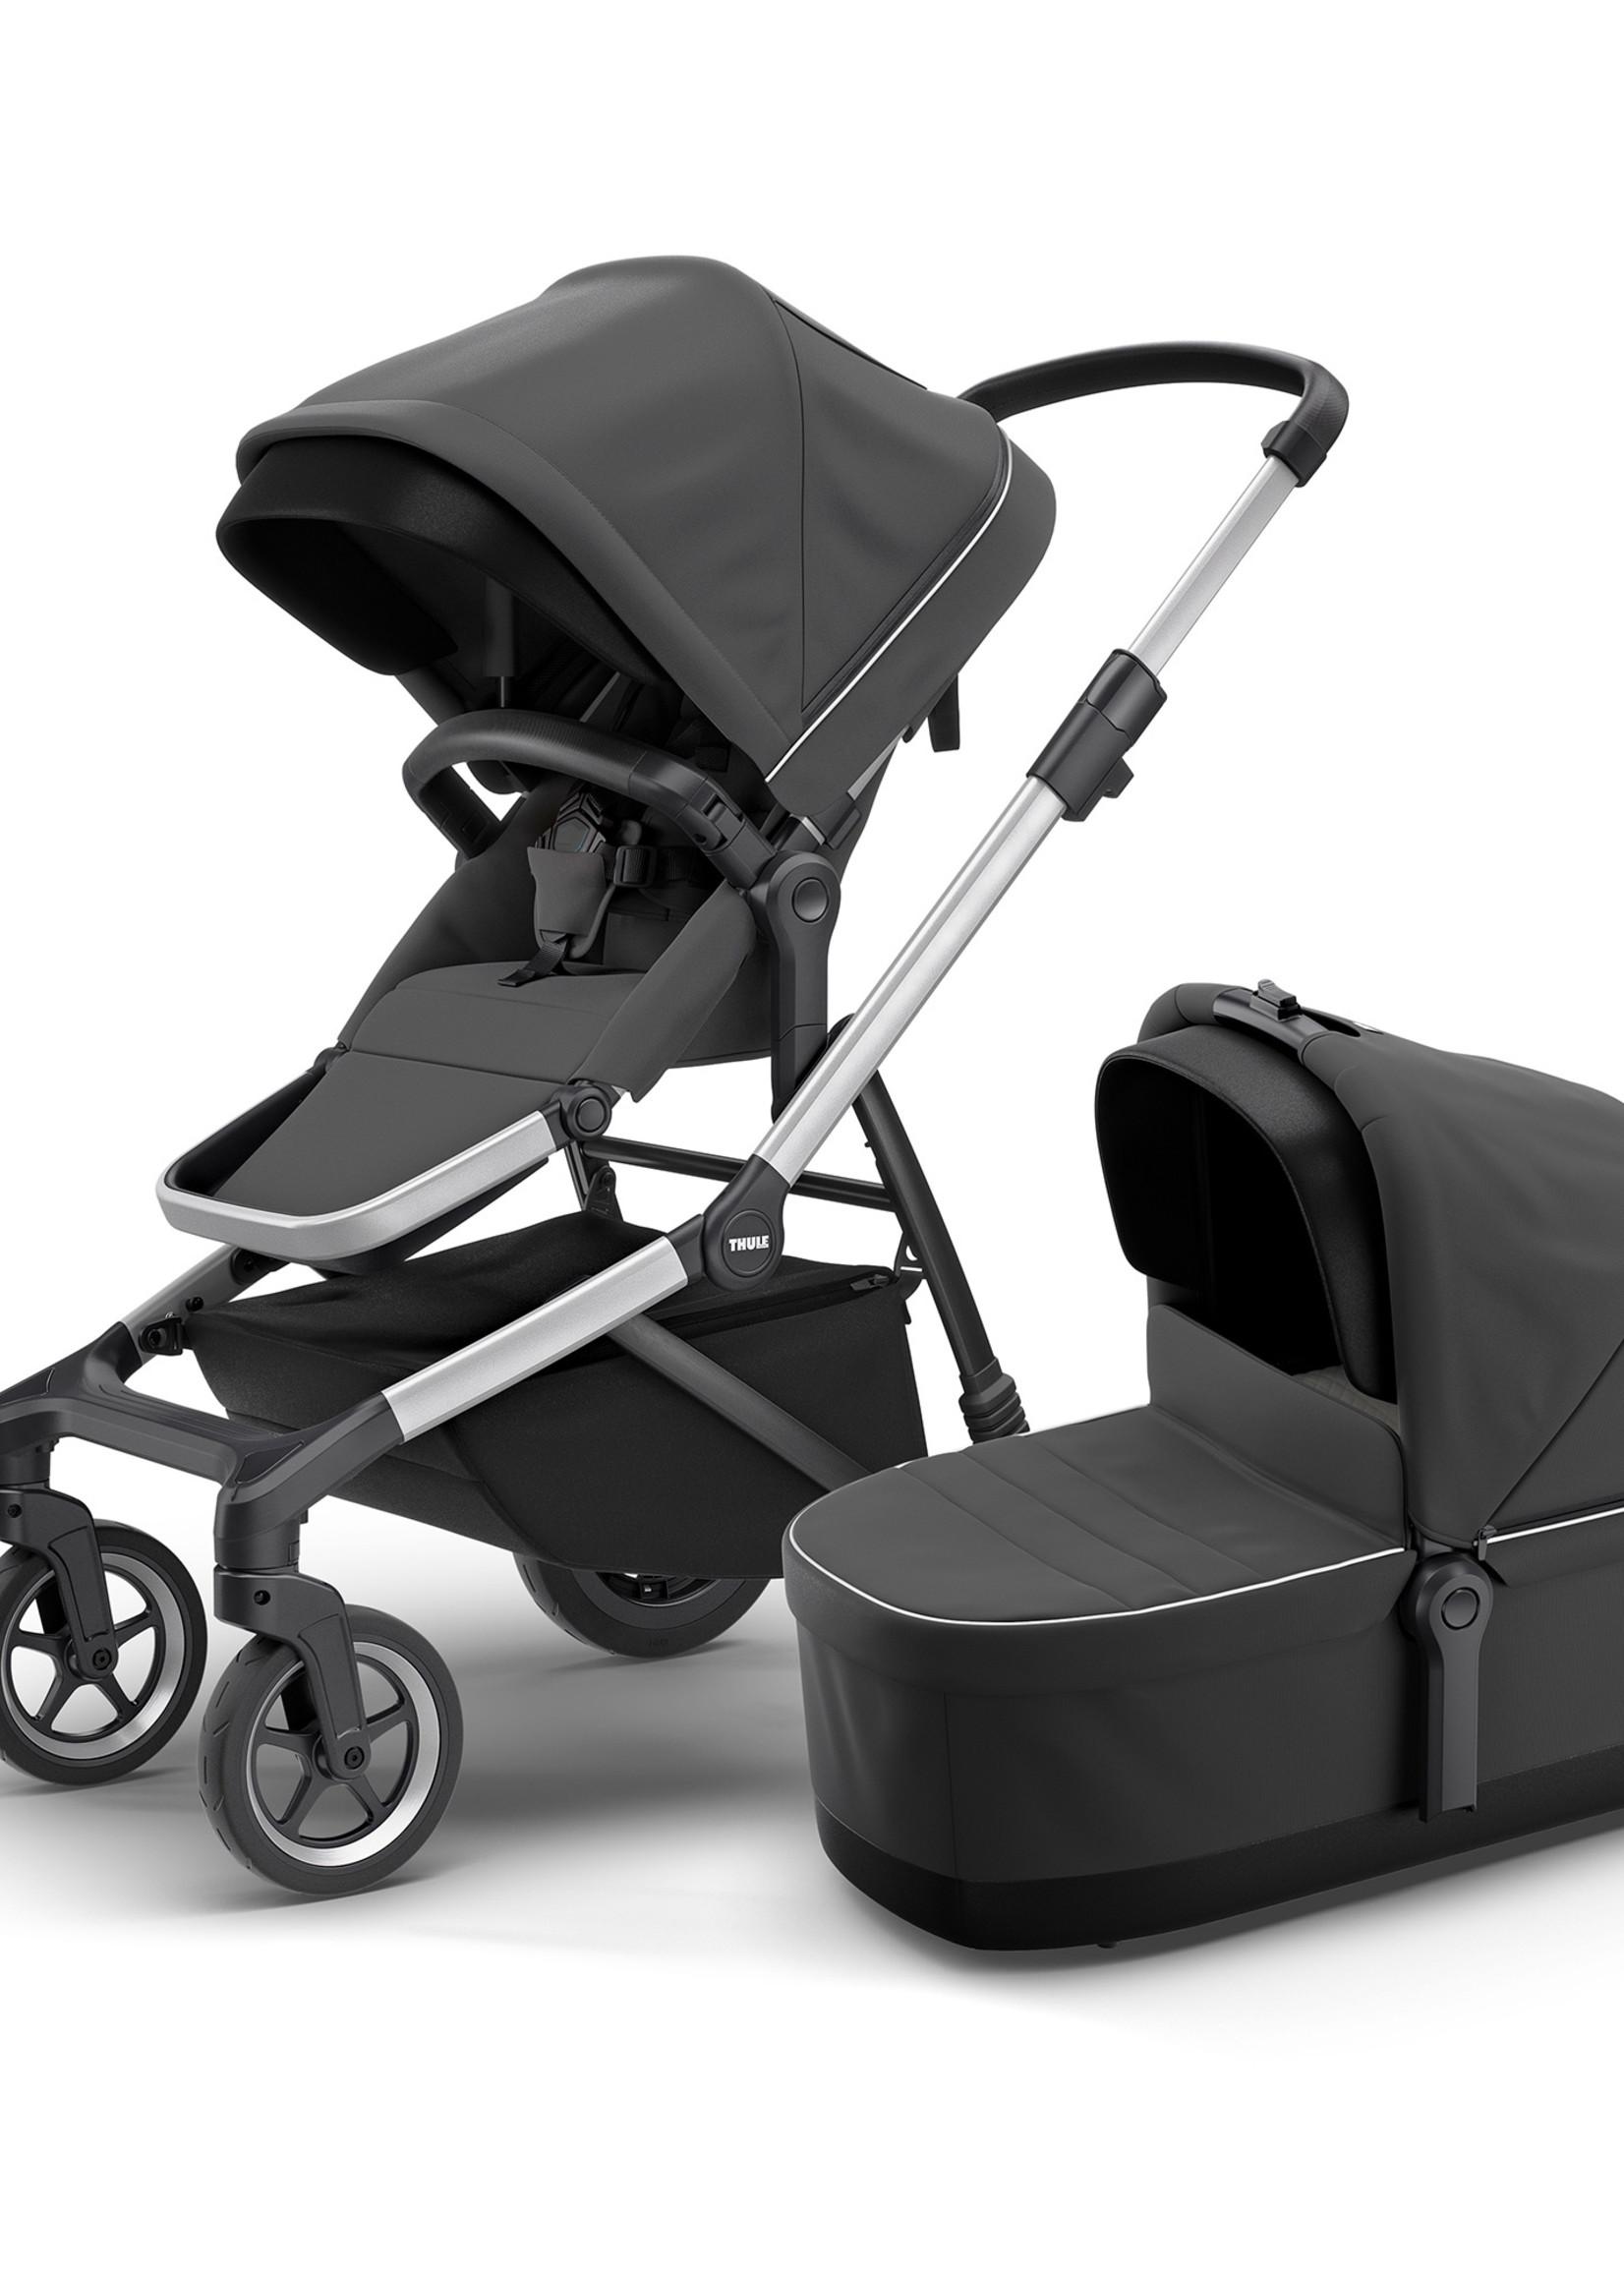 Thule Sleek Infant Stroller Bundle – Seat and Bassinet